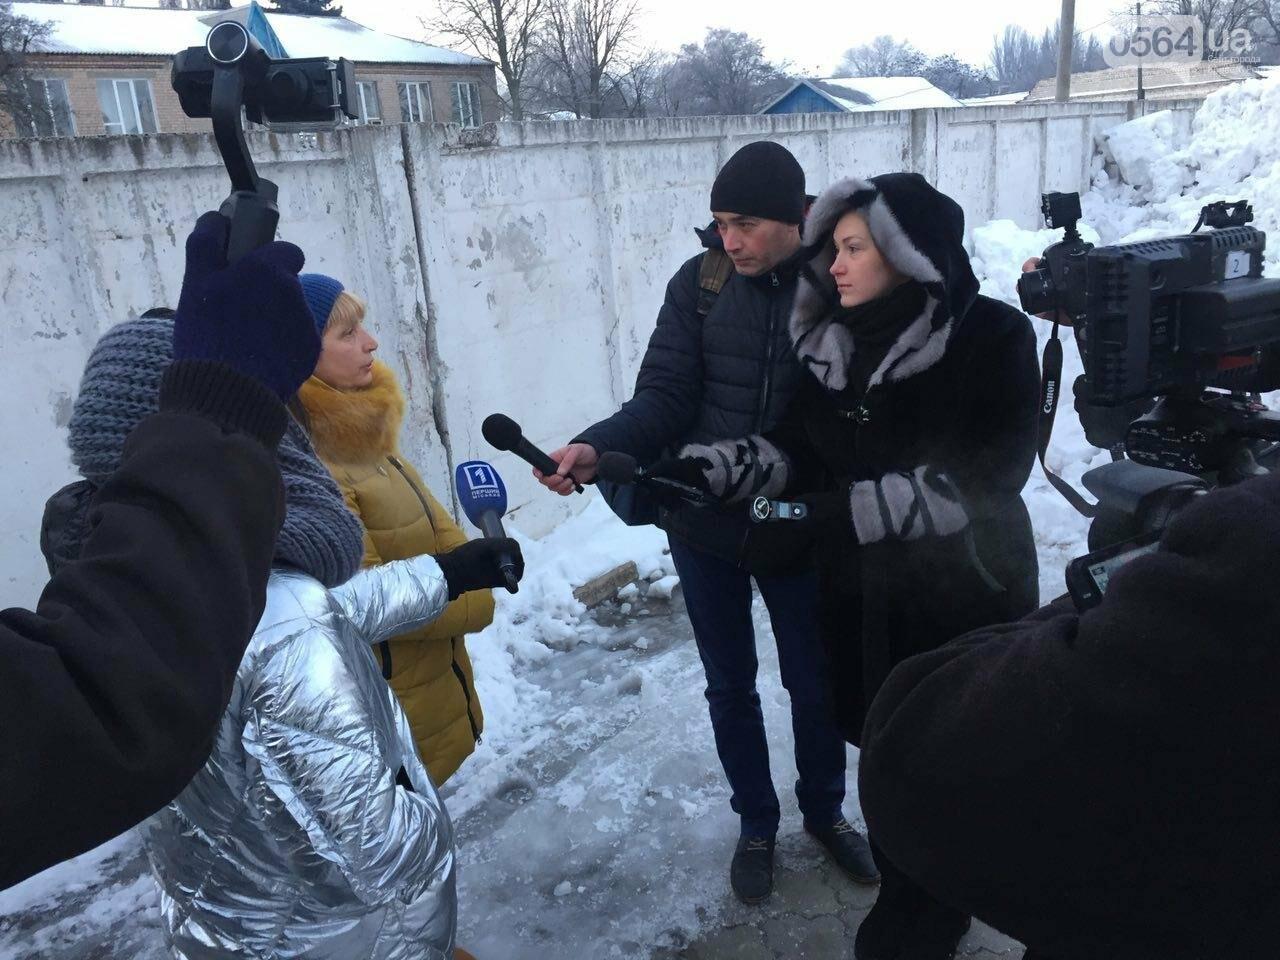 В Кривой Рог вернулся журналист Вячеслав Волк, тяжело раненый во время учений резервистов (ФОТО), фото-10